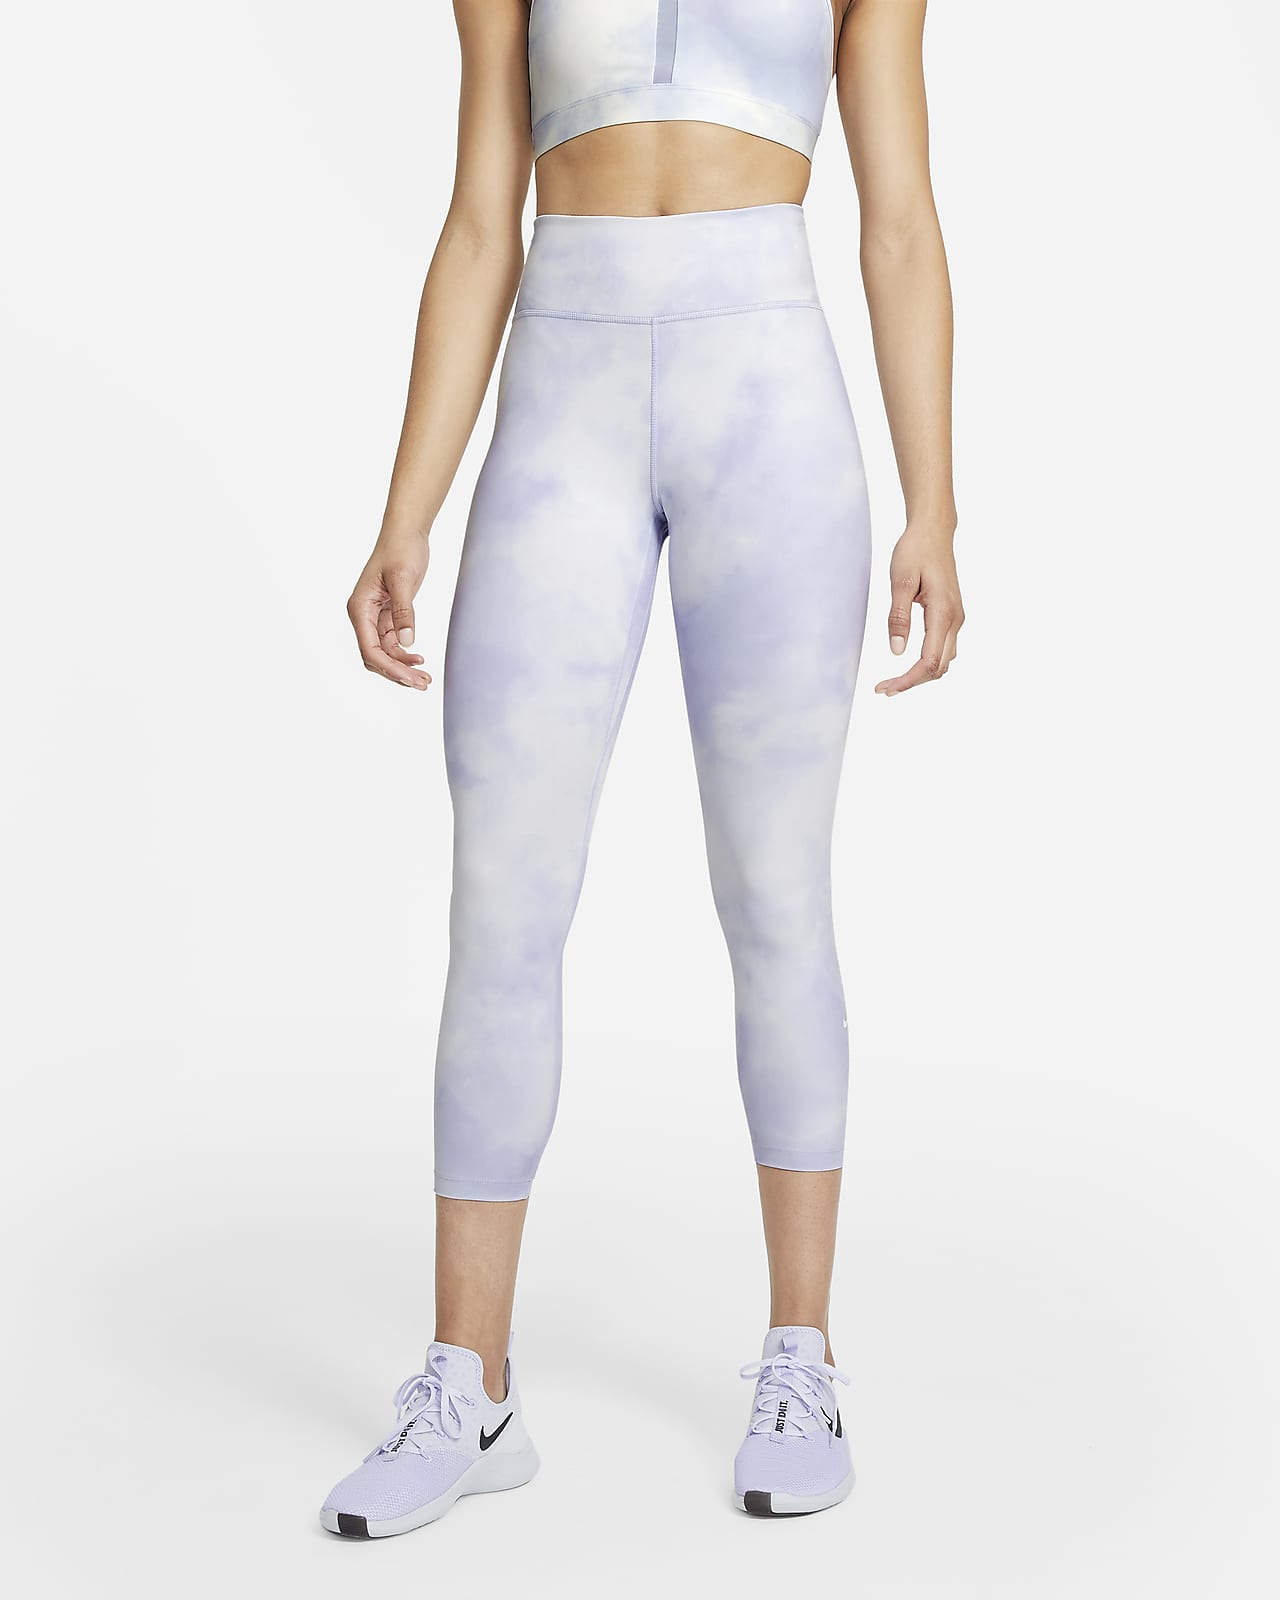 Nike One Icon Clash Korte legging met halfhoge taille voor dames